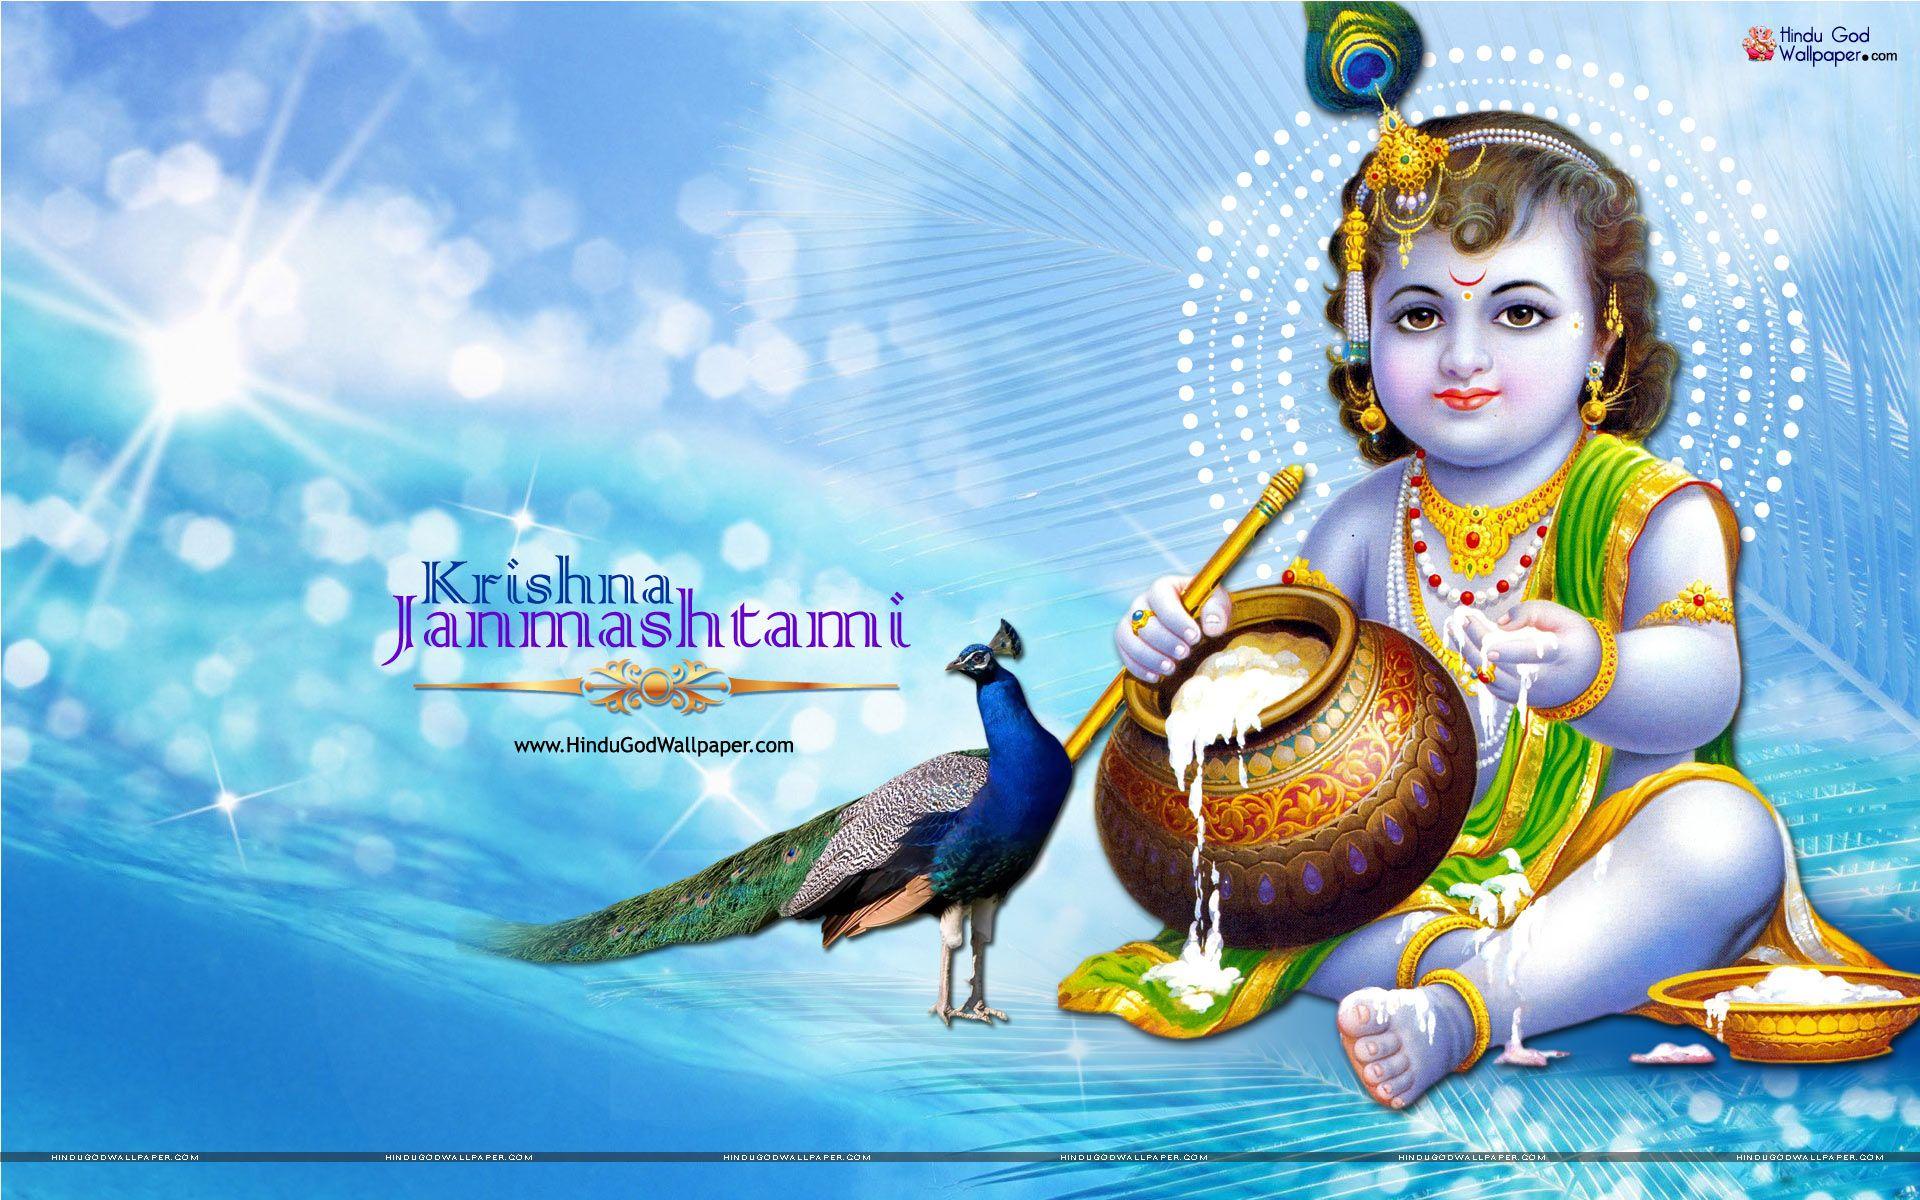 Wallpaper download janmashtami - Krishna Janmashtami Animation Wallpaper Download